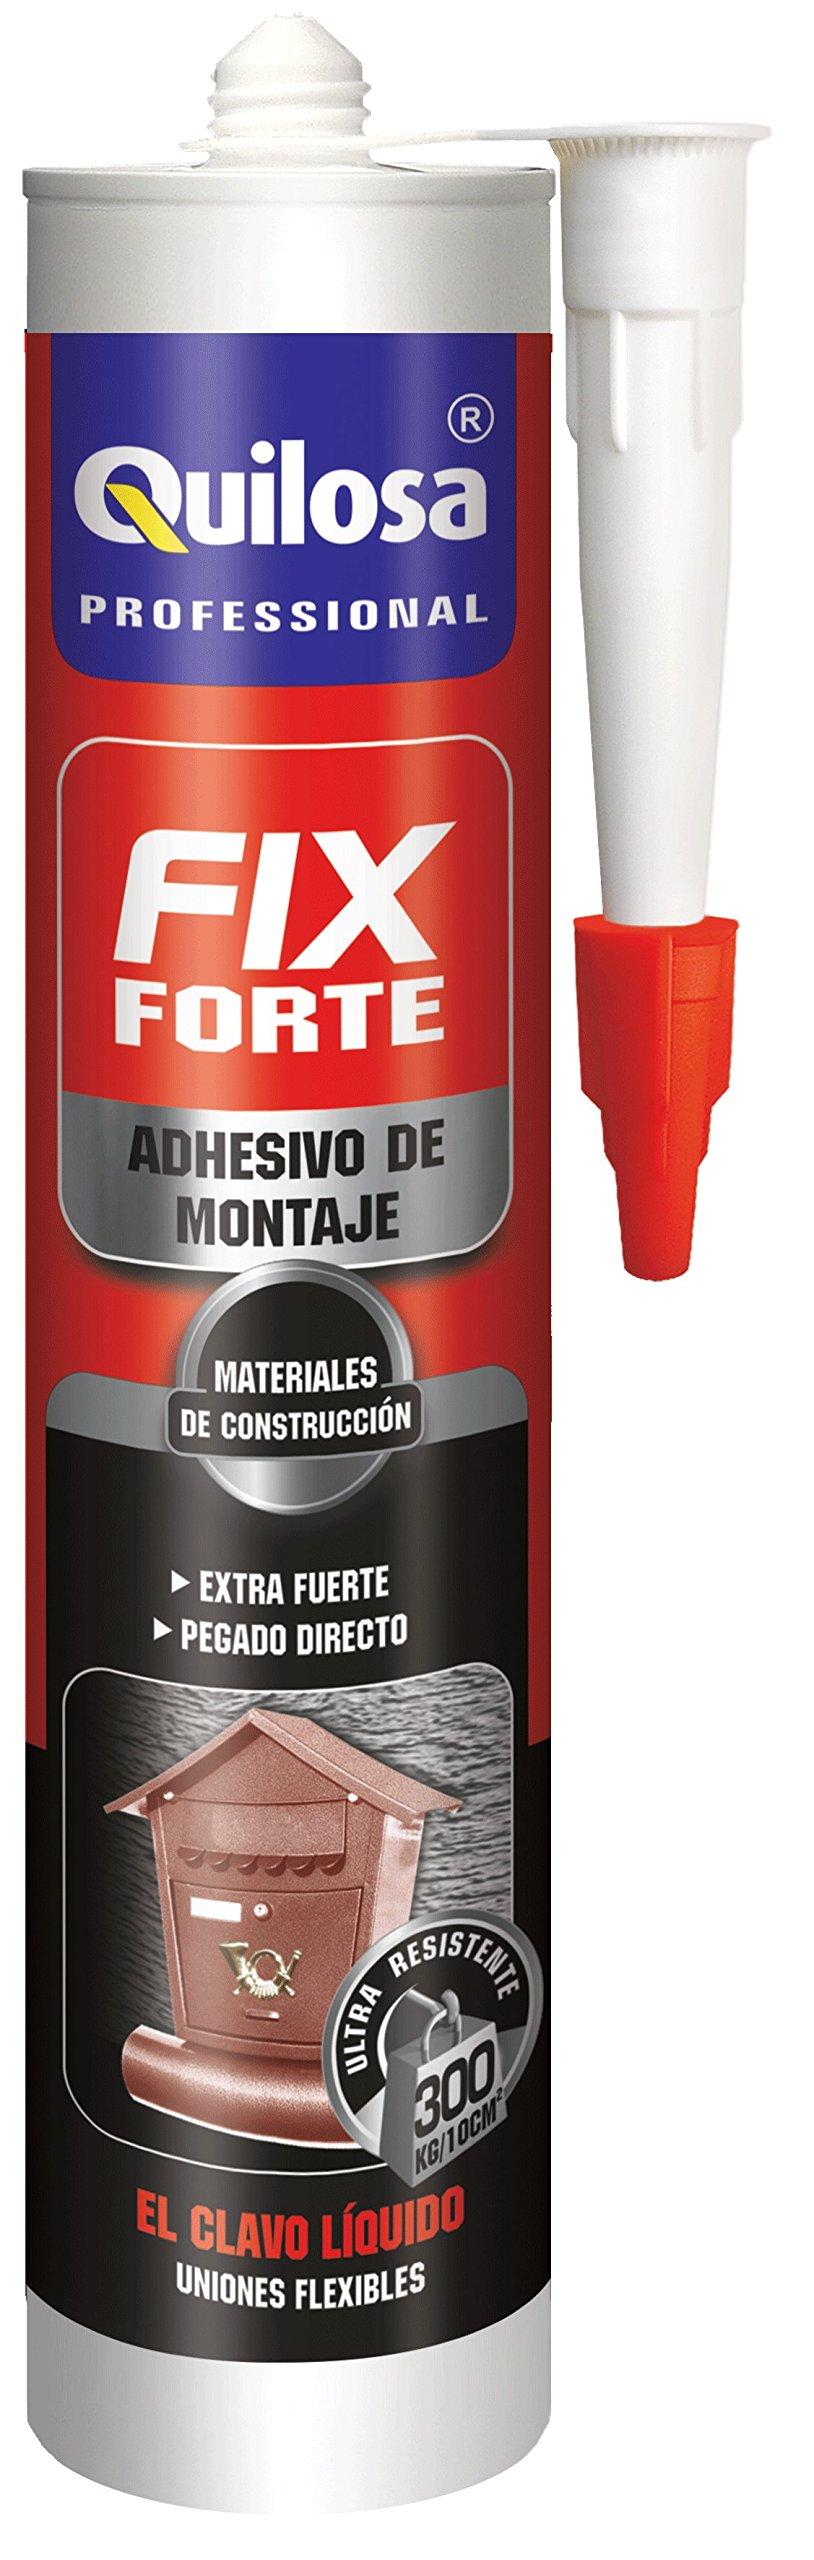 Quilosa T045120 Adhesivo de Montaje Forte, Crema product image